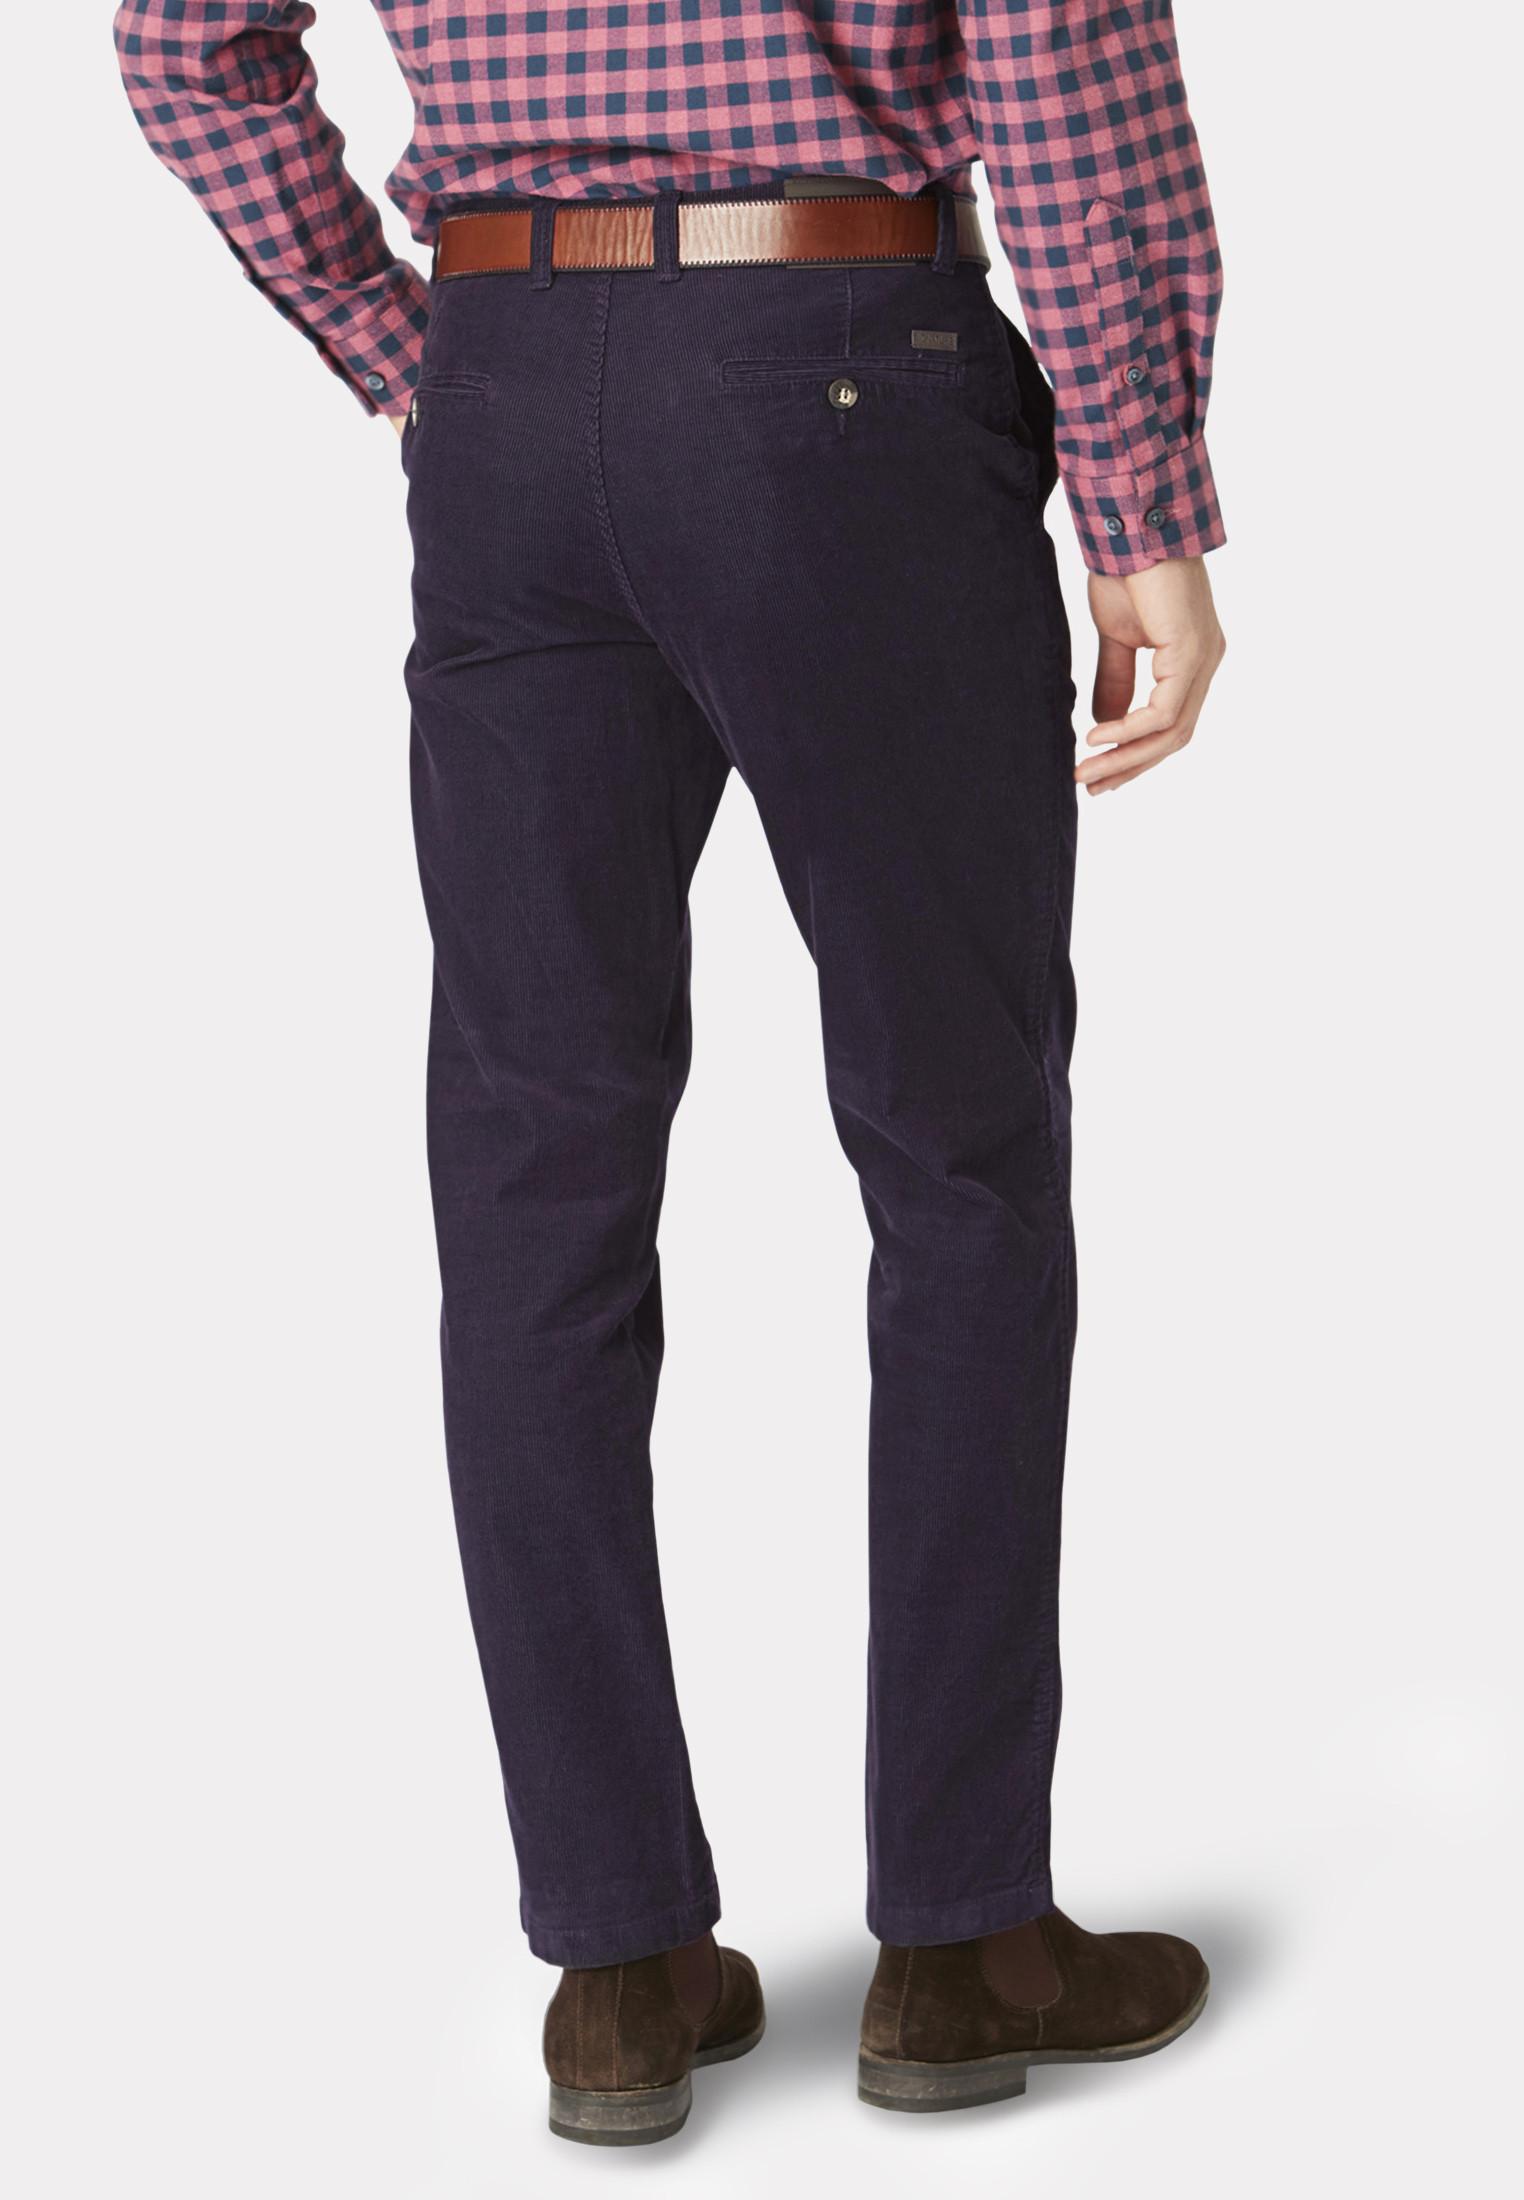 Grape Finningley Cord Trousers